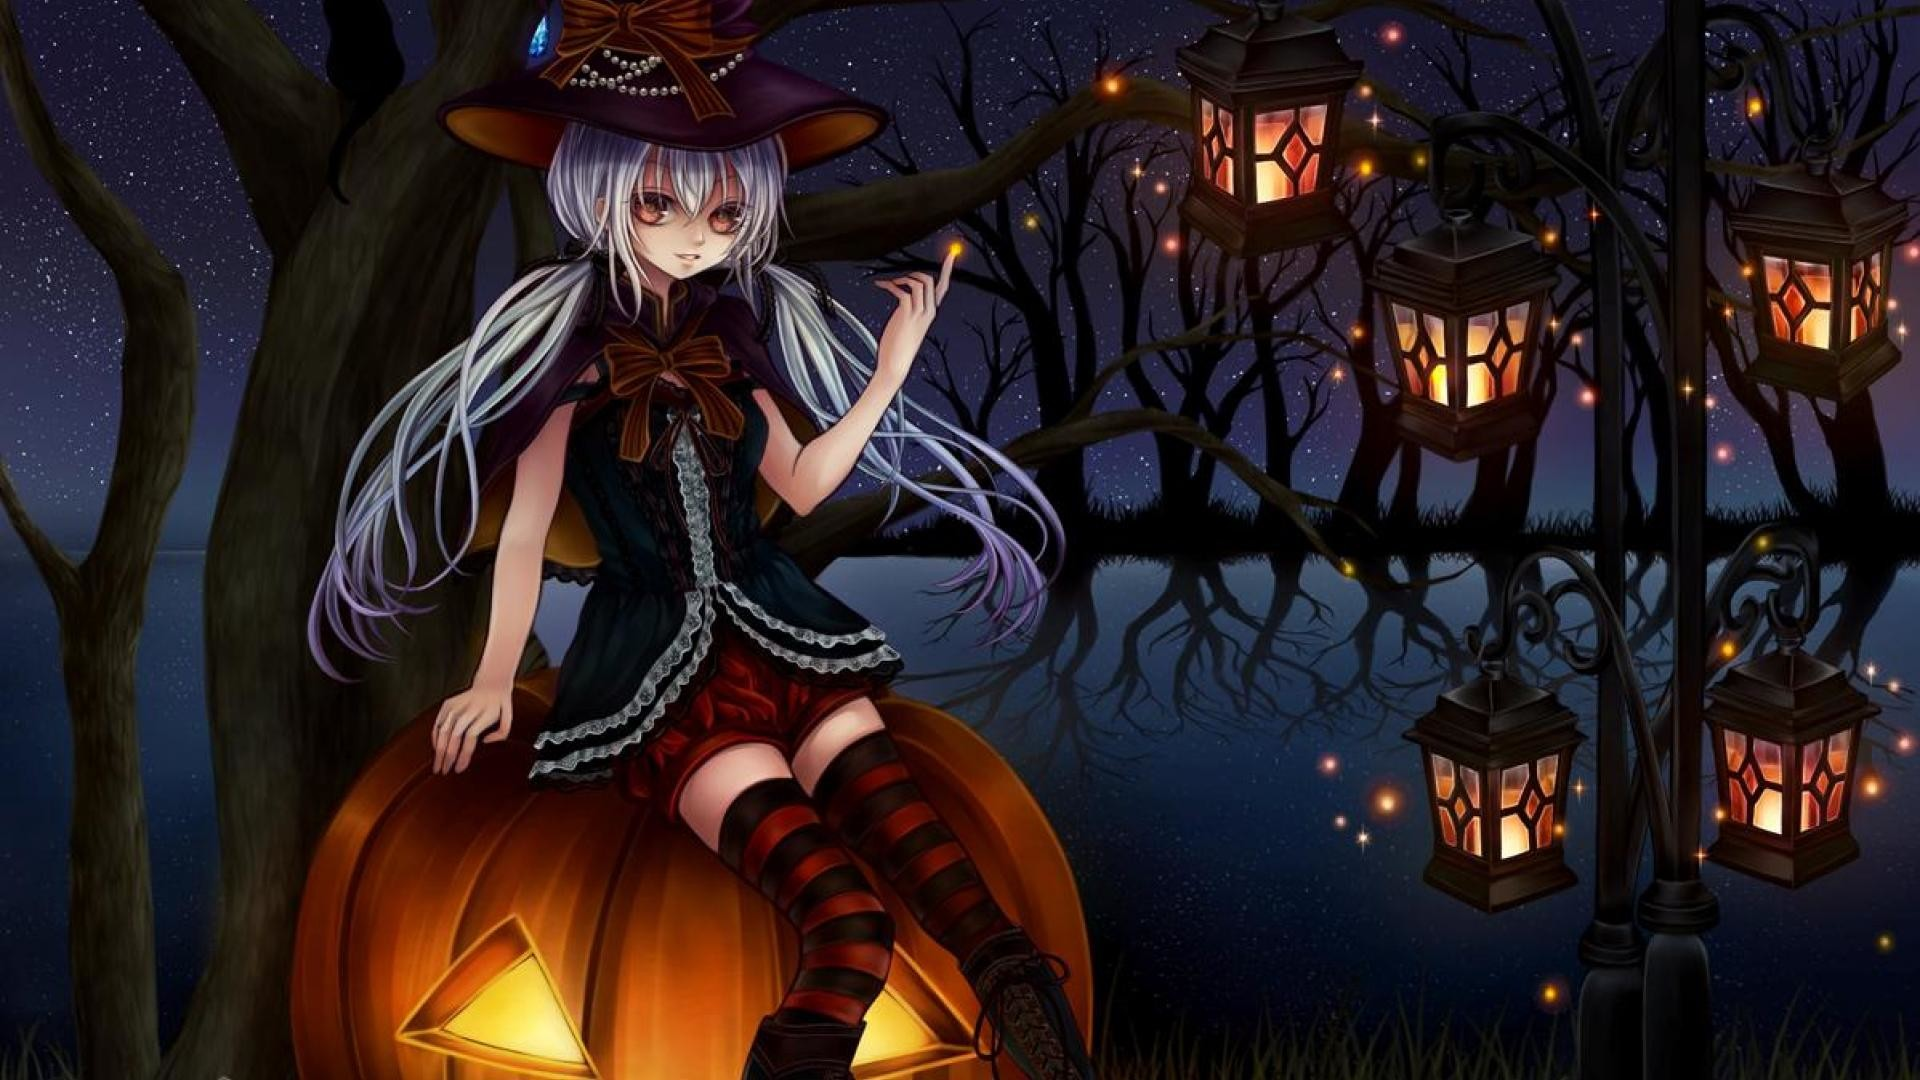 [46+] Gambar HD Anime Halloween Wallpapers on WallpaperSafari